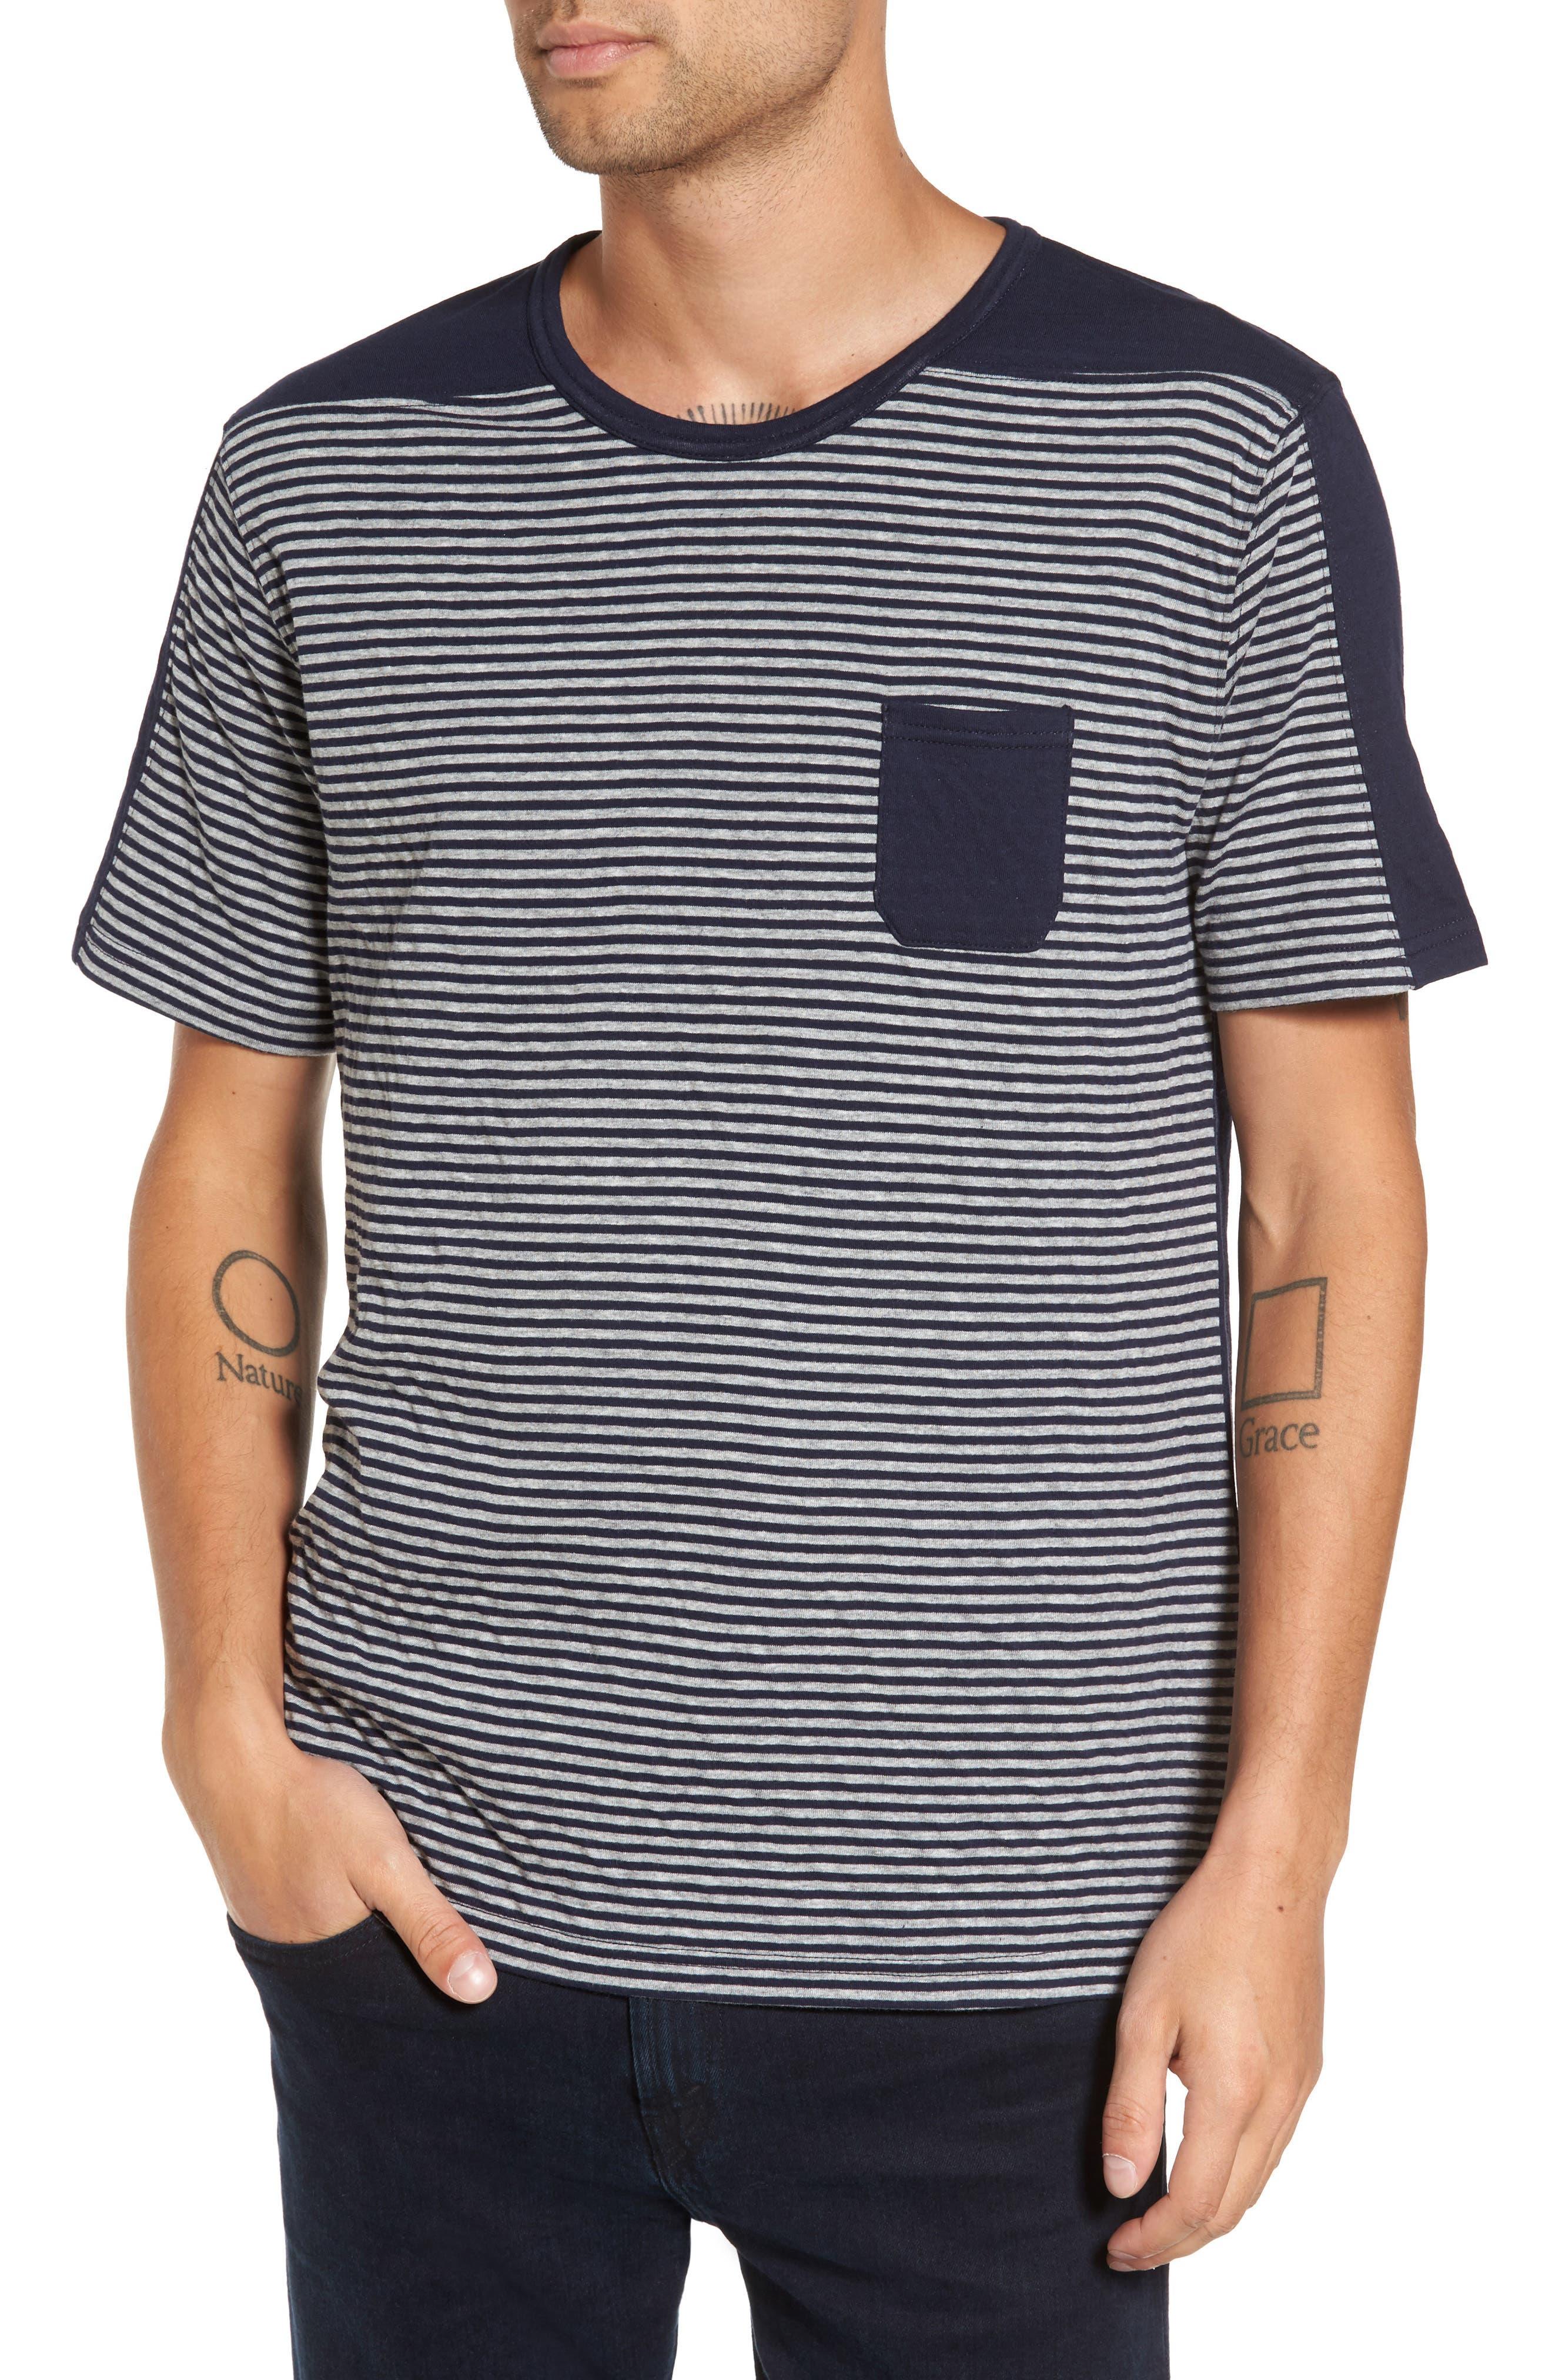 Striped Pocket T-Shirt,                             Main thumbnail 1, color,                             Navy/ White Stripe